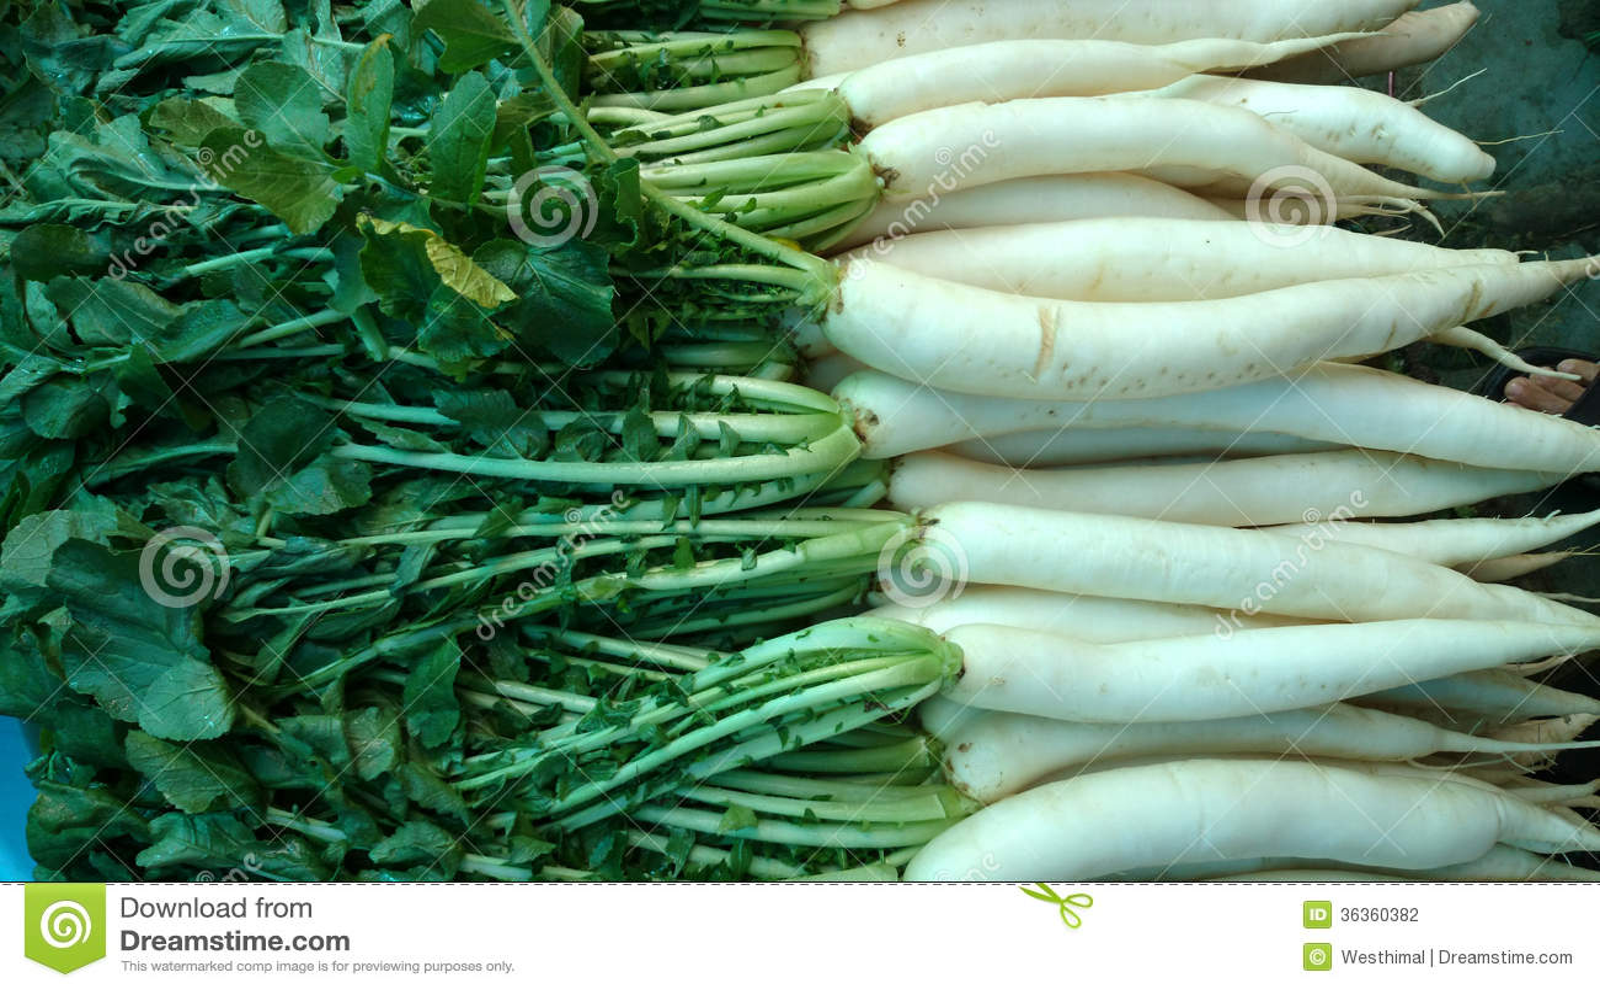 how to eat white radish